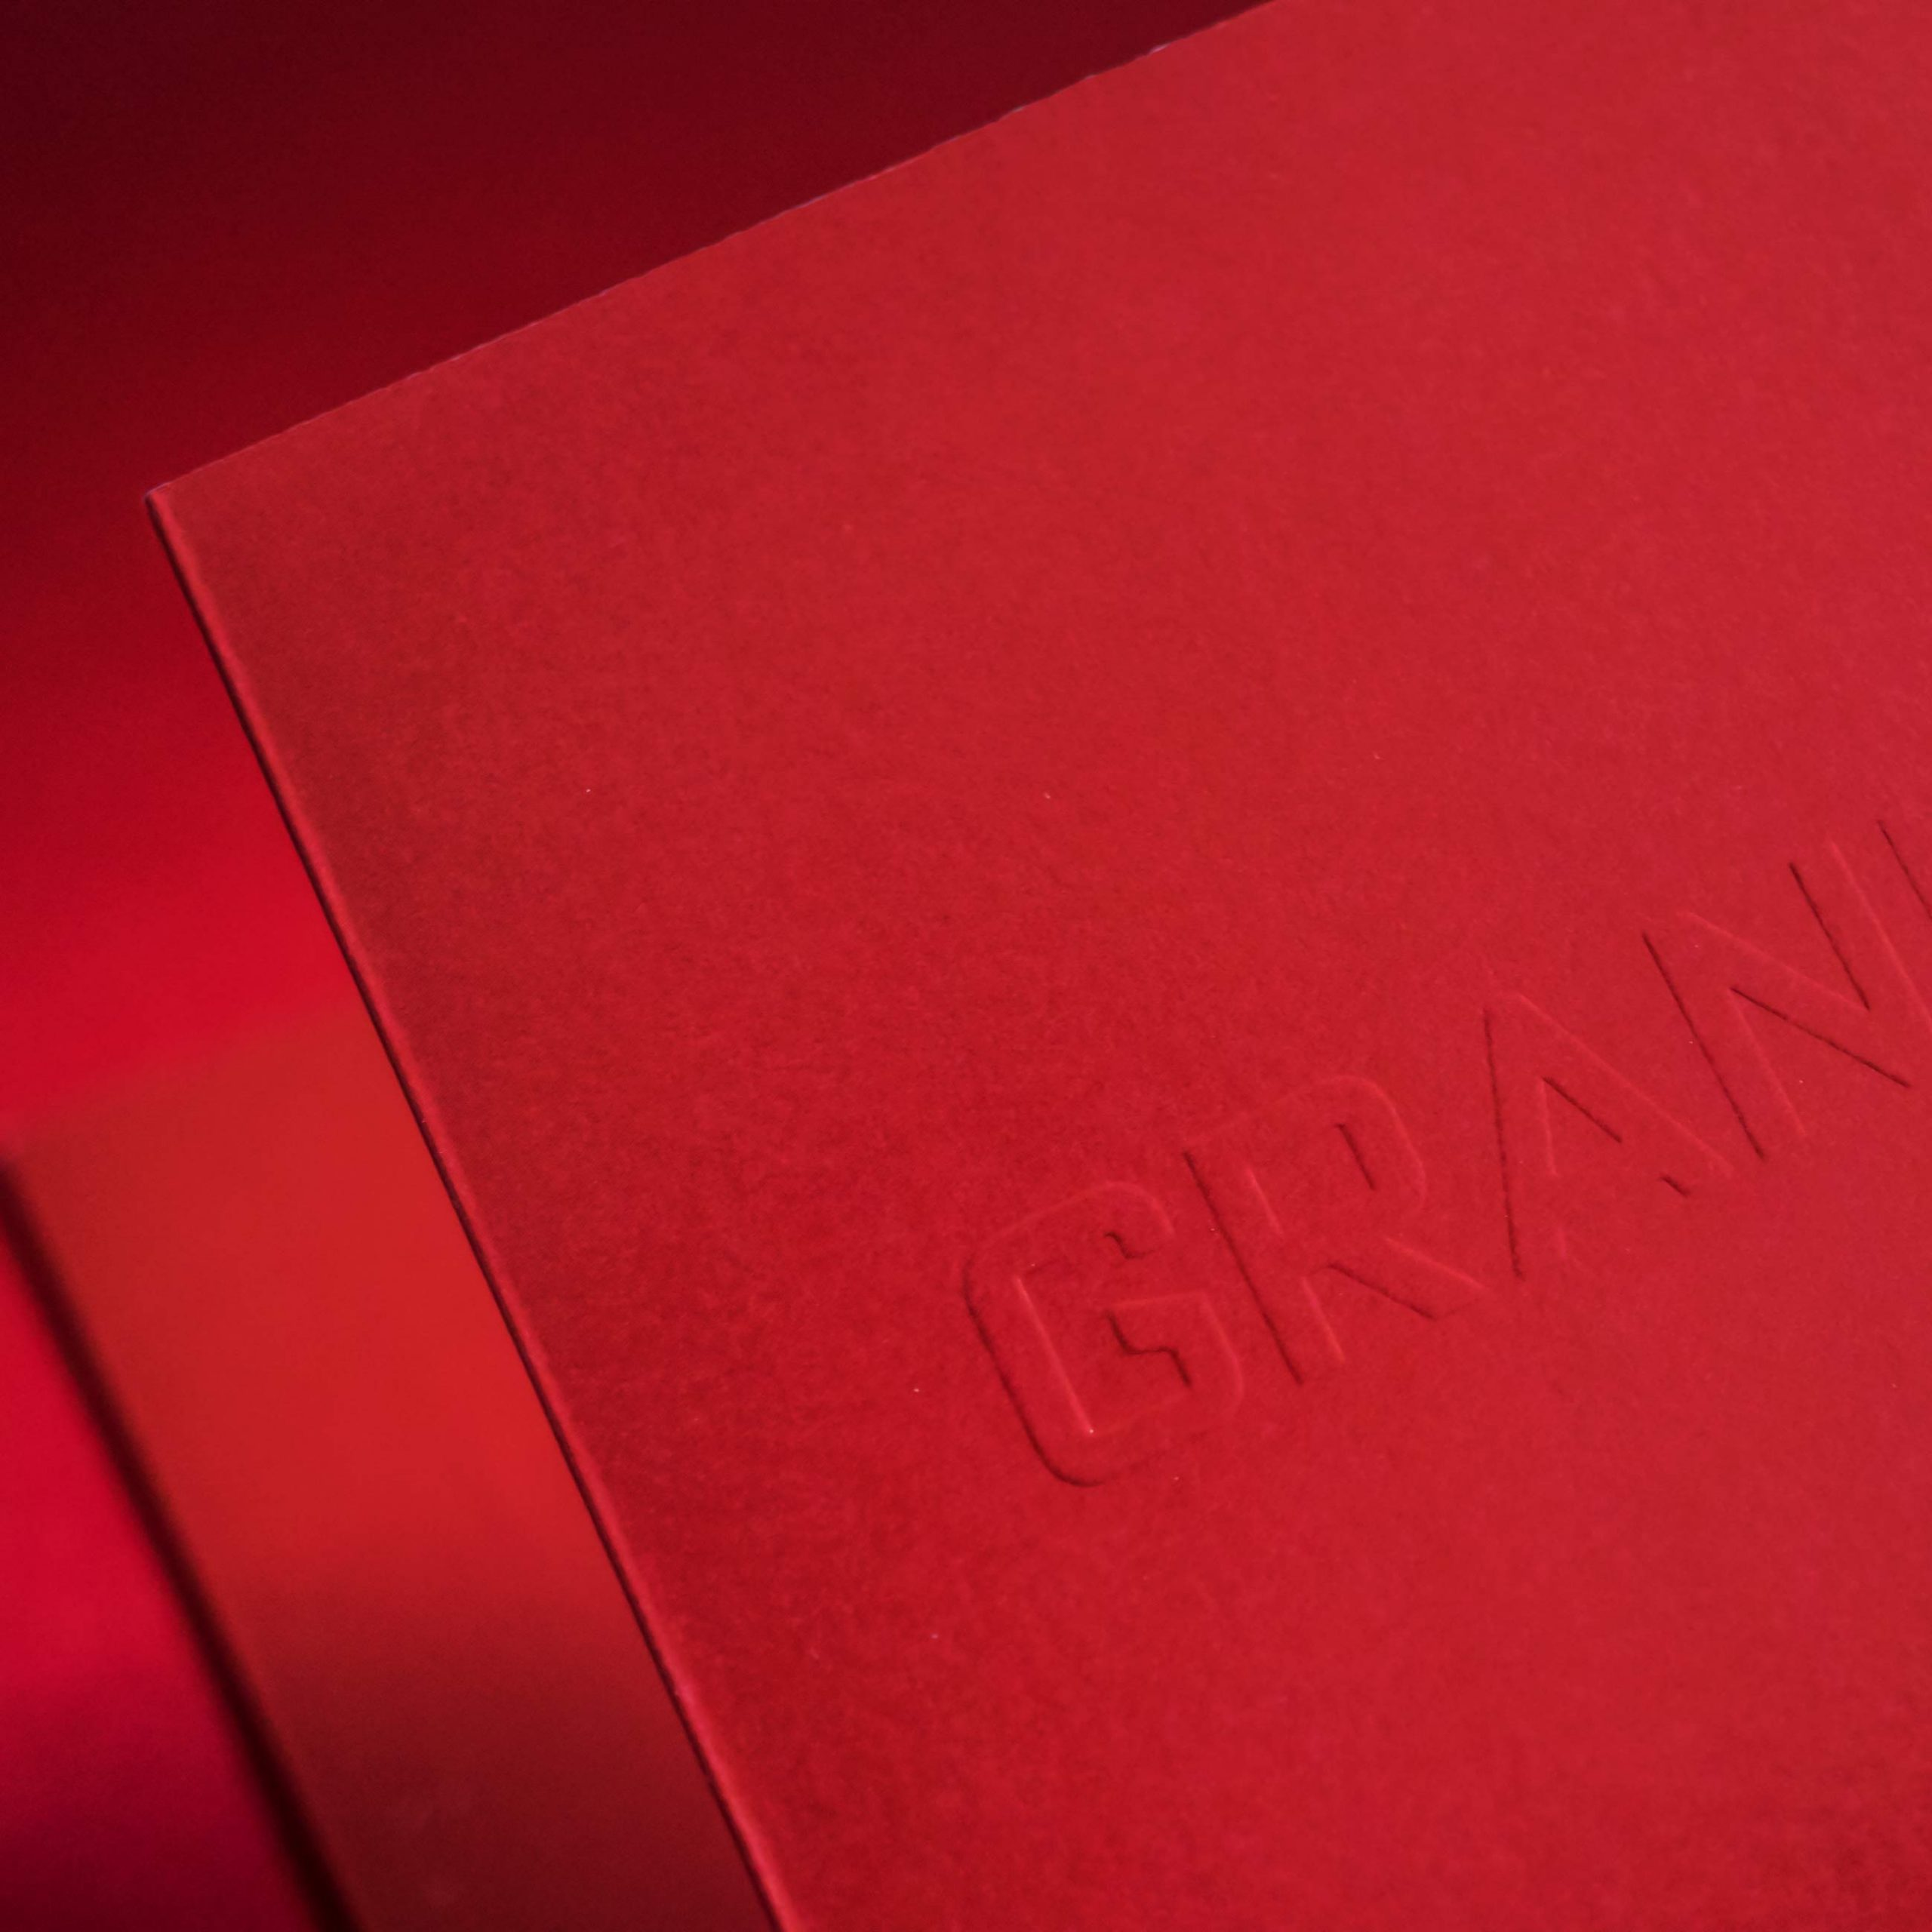 Startling Brands GRANDEN Insurance Consultancy Branding